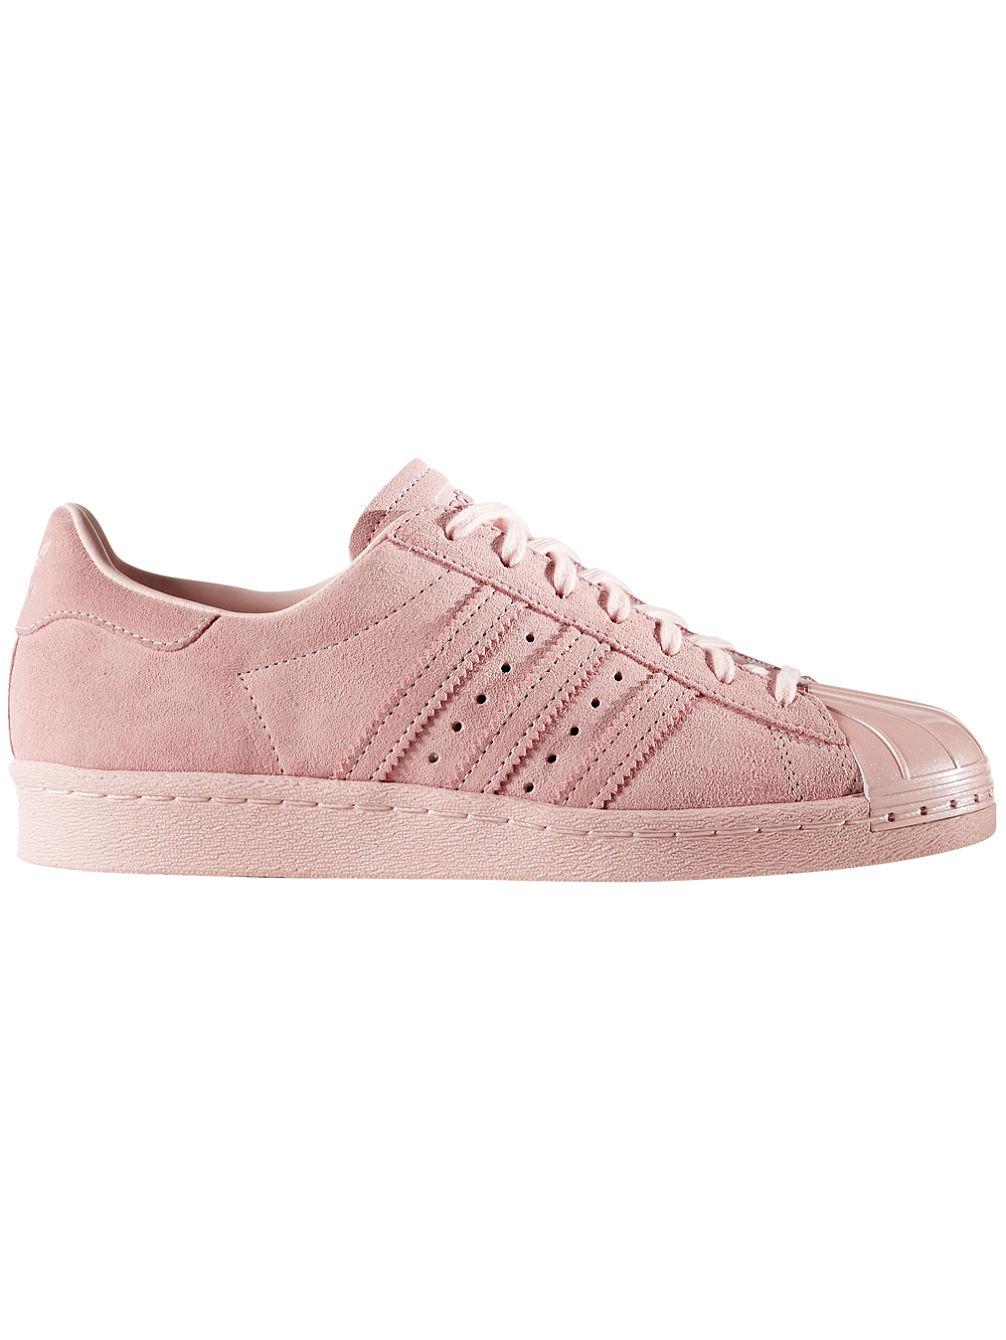 wholesale dealer b30cb 29ba3 Superstar 80s Metal Toe W Sneakers Women. adidas Originals